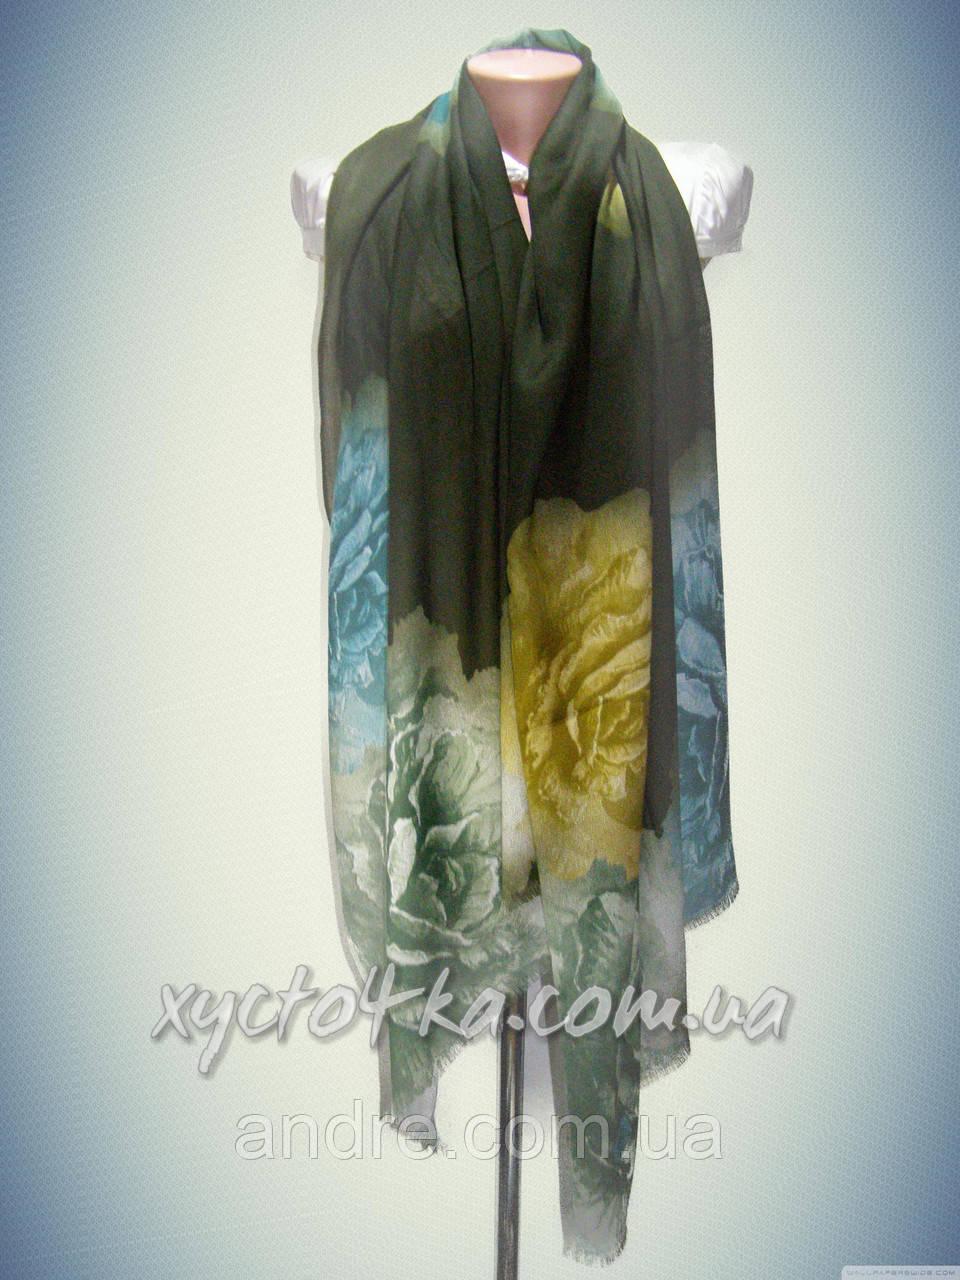 Турецкие шарфы палантины Натюрморт, зелёный